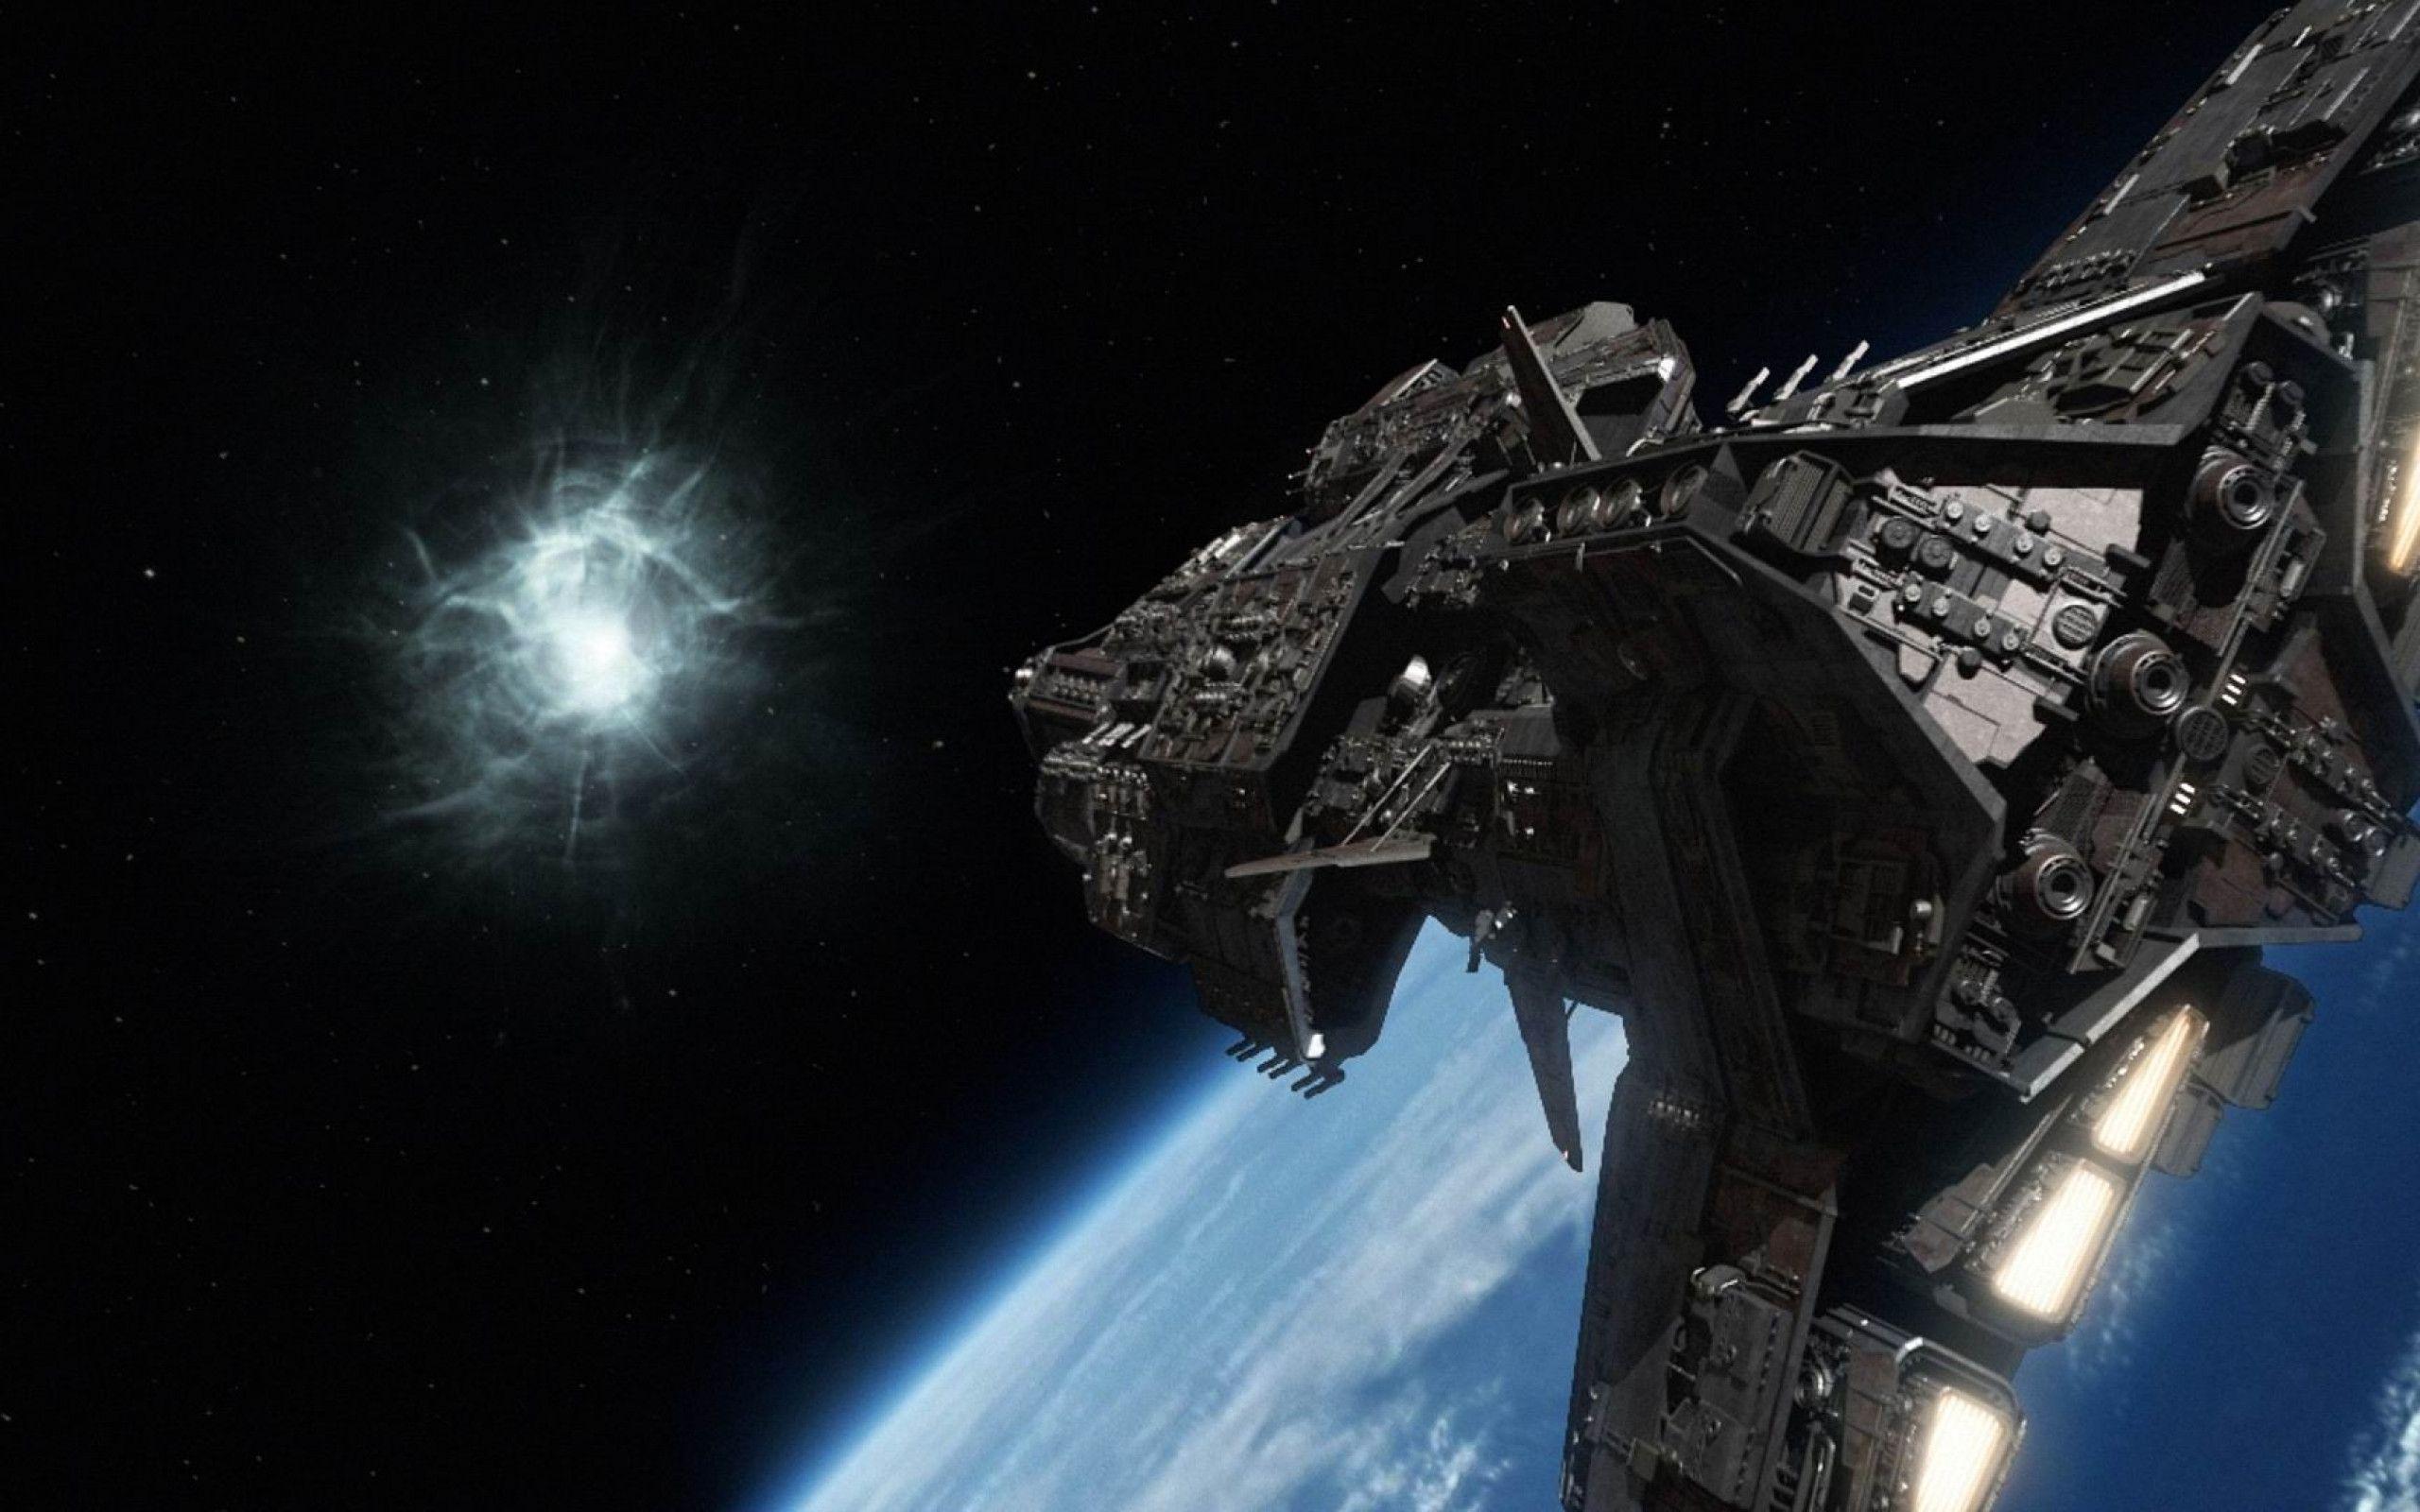 stargate wallpaper universe space - photo #12